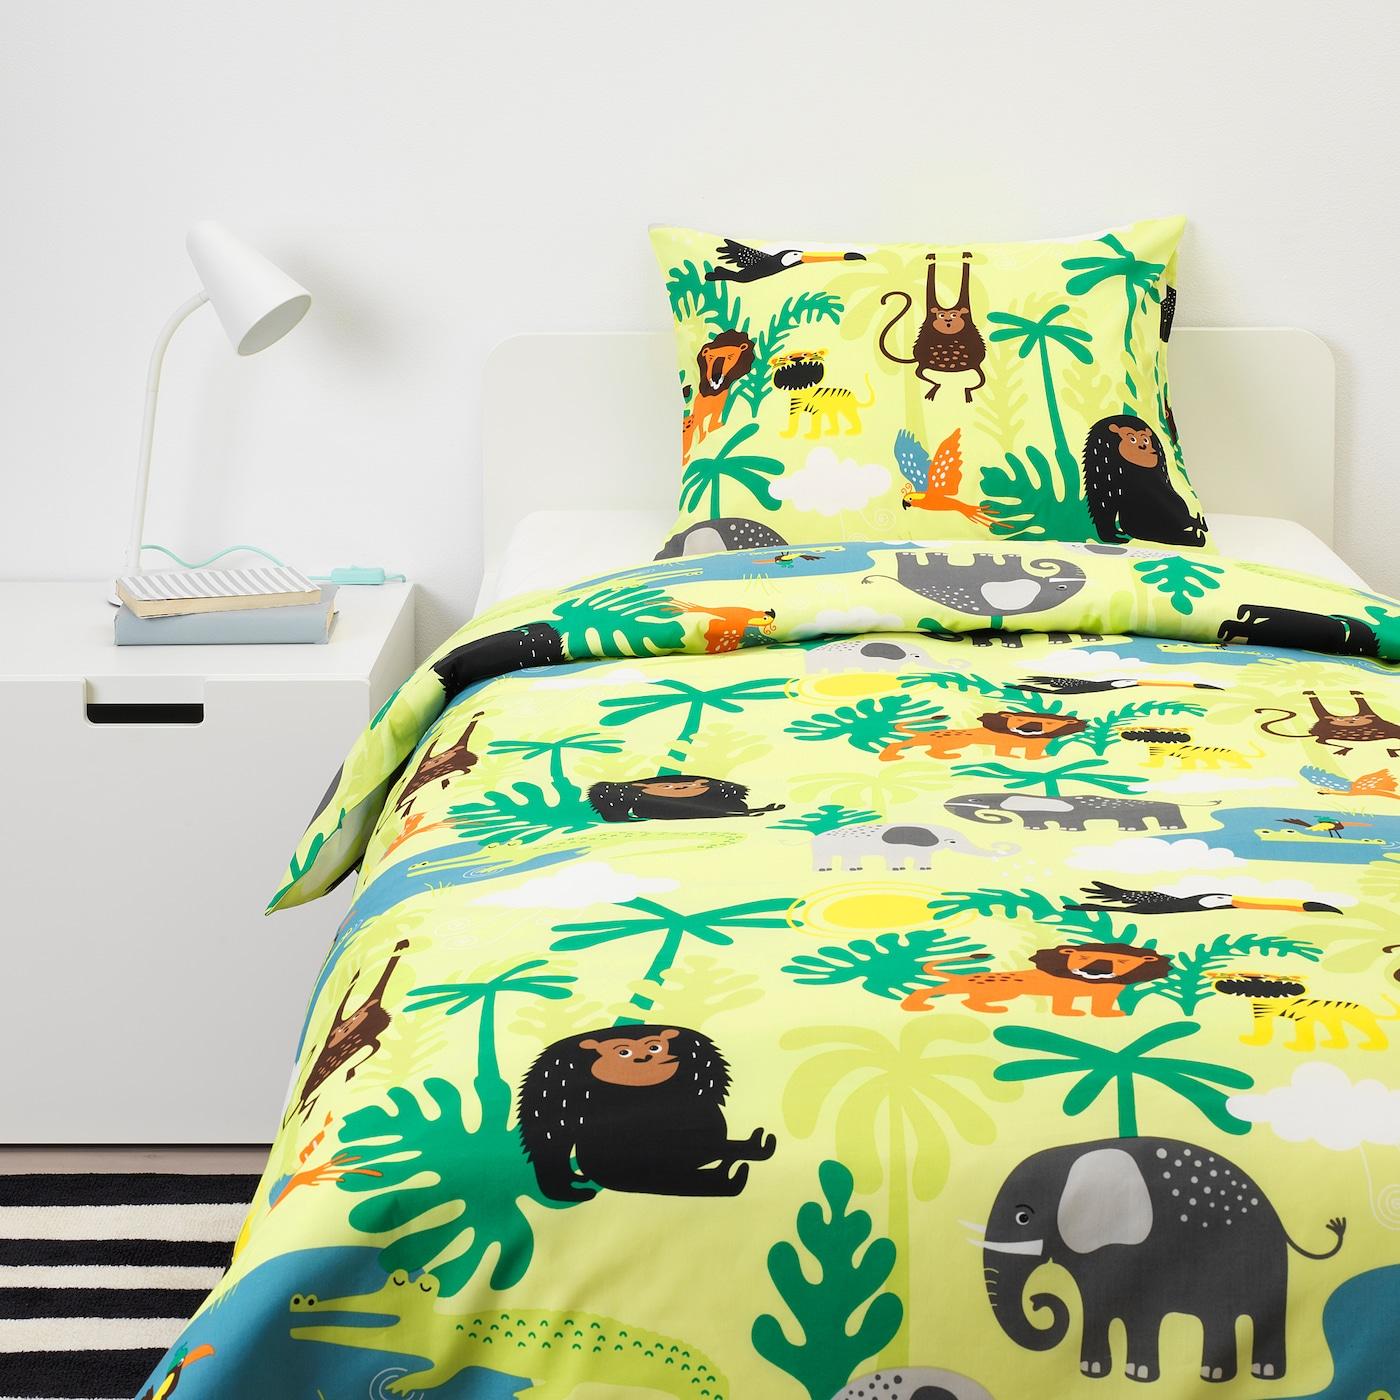 DJUNGELSKOG 尤恩格斯库格 被套和枕套, 动物/绿色, 150x200/50x80 厘米